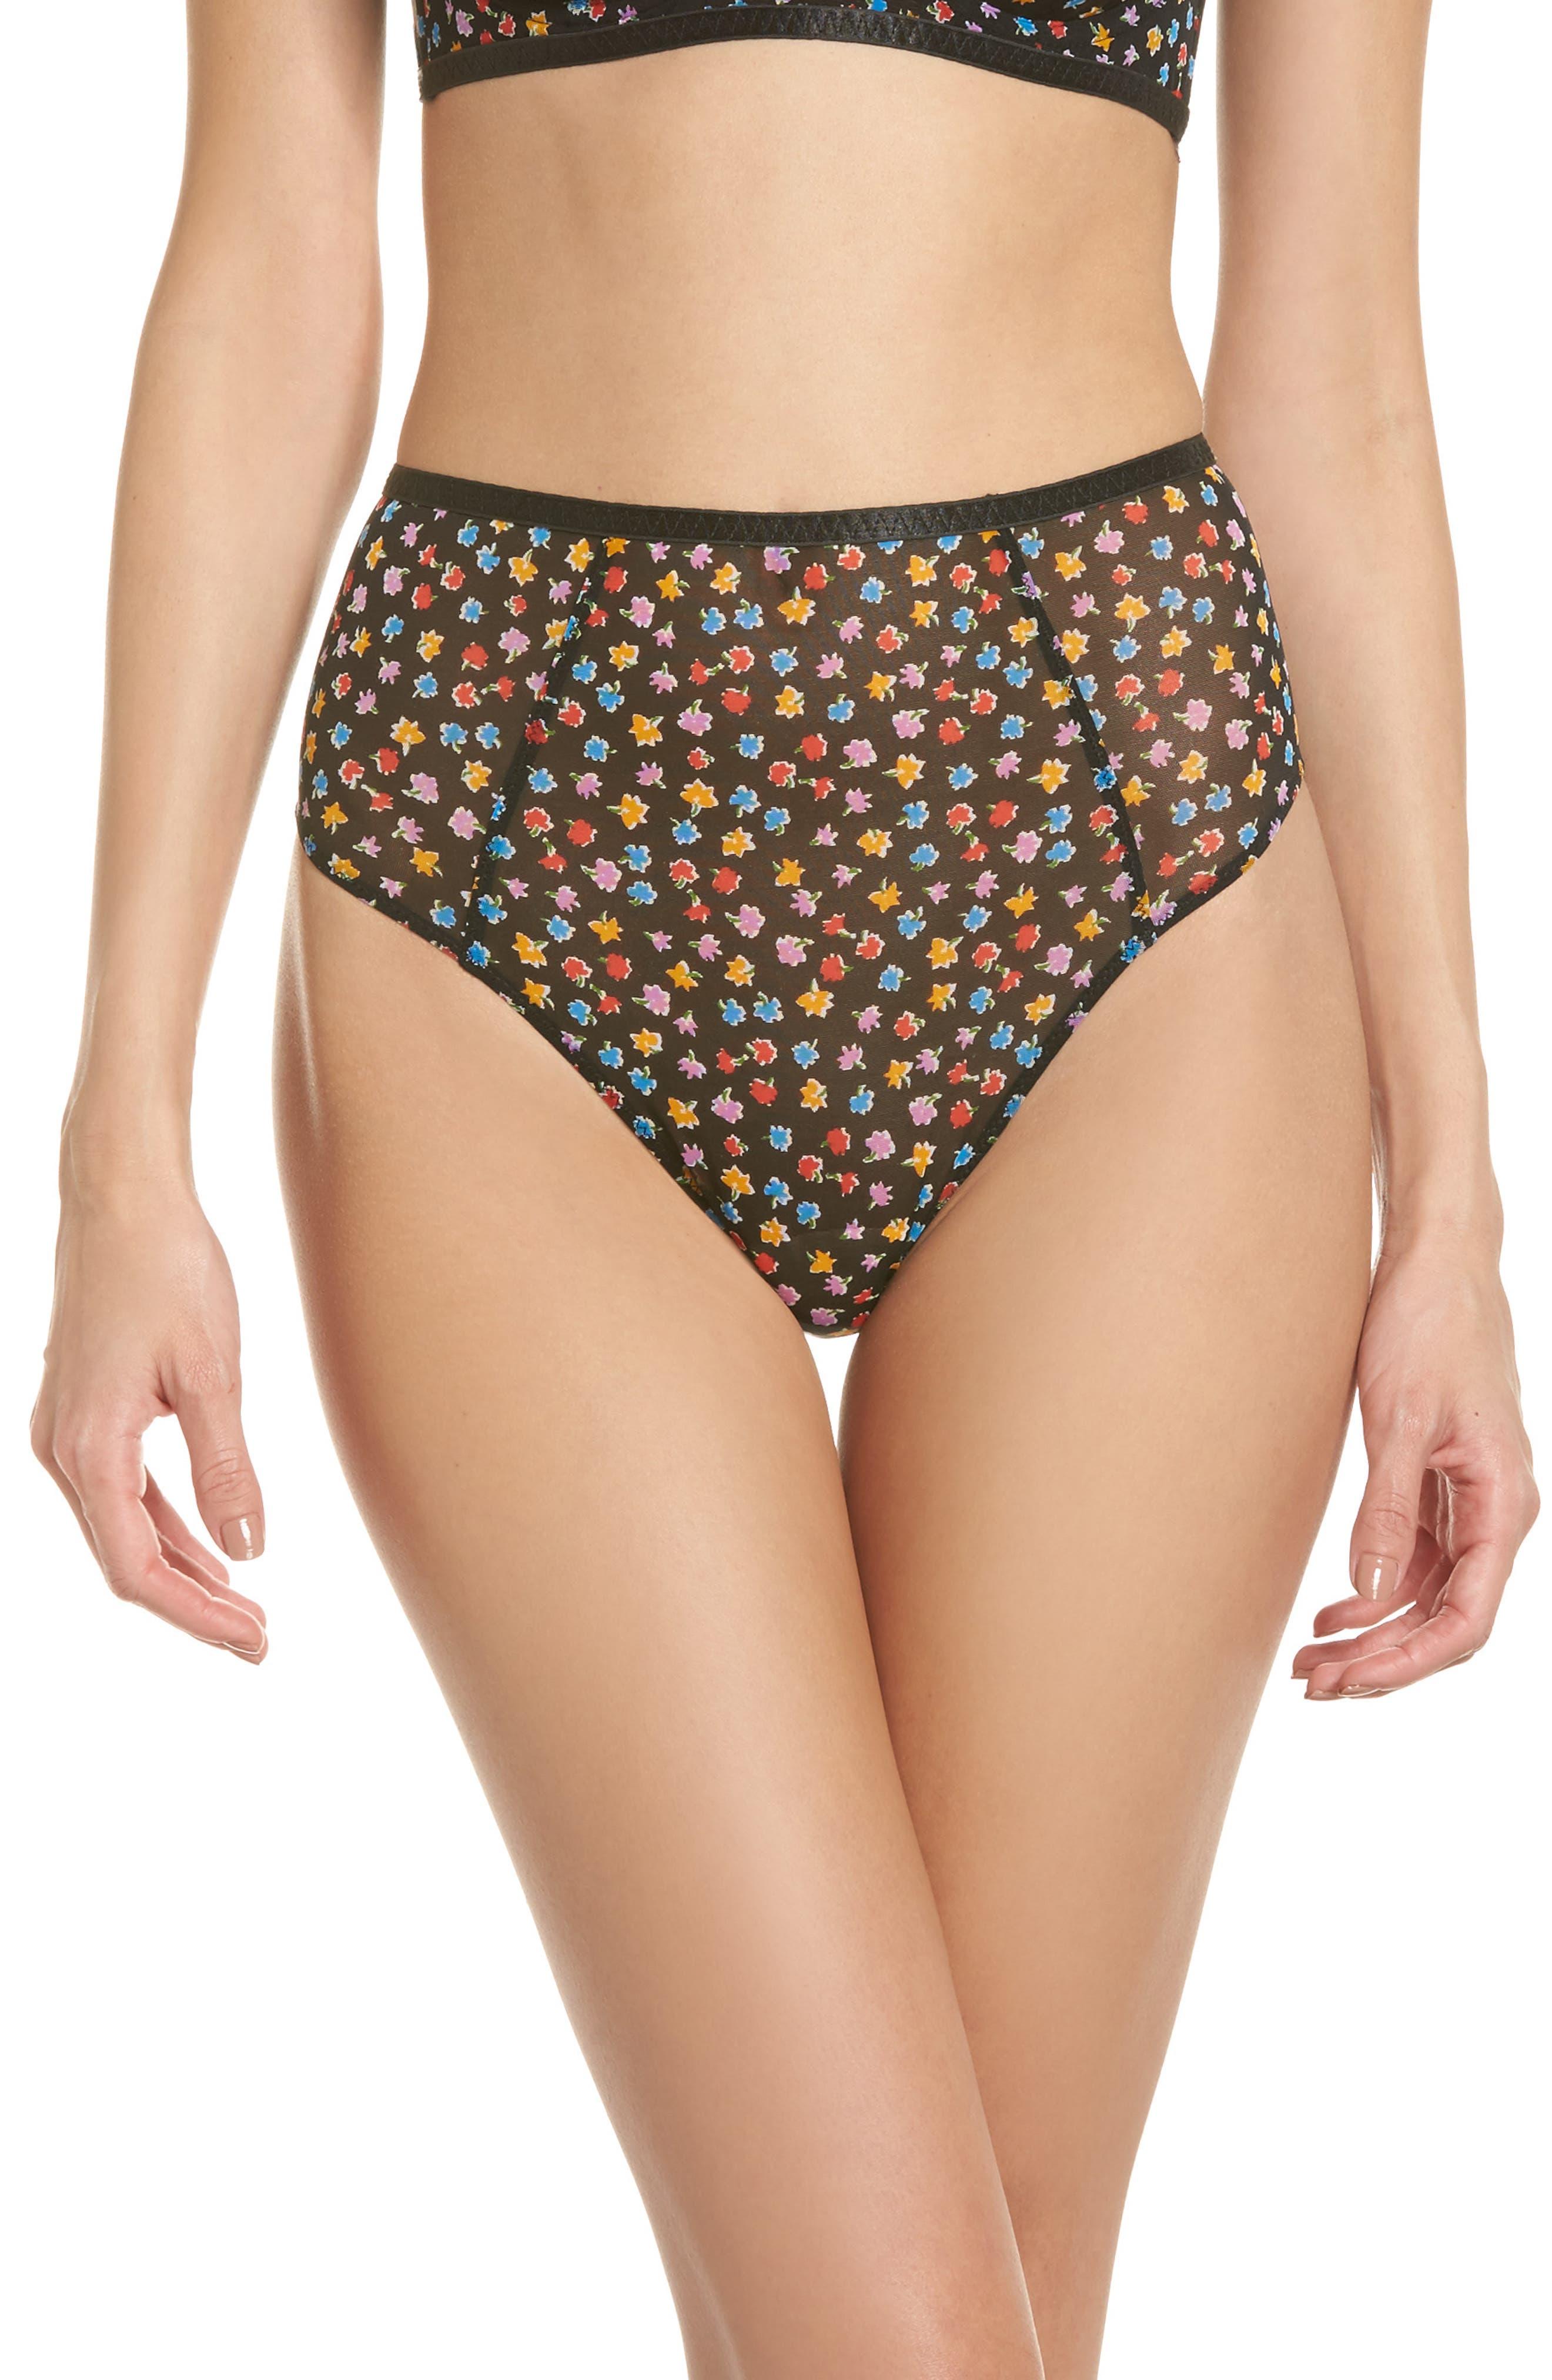 Intimately FP Capri High Waist Panties,                             Main thumbnail 1, color,                             Black Combo